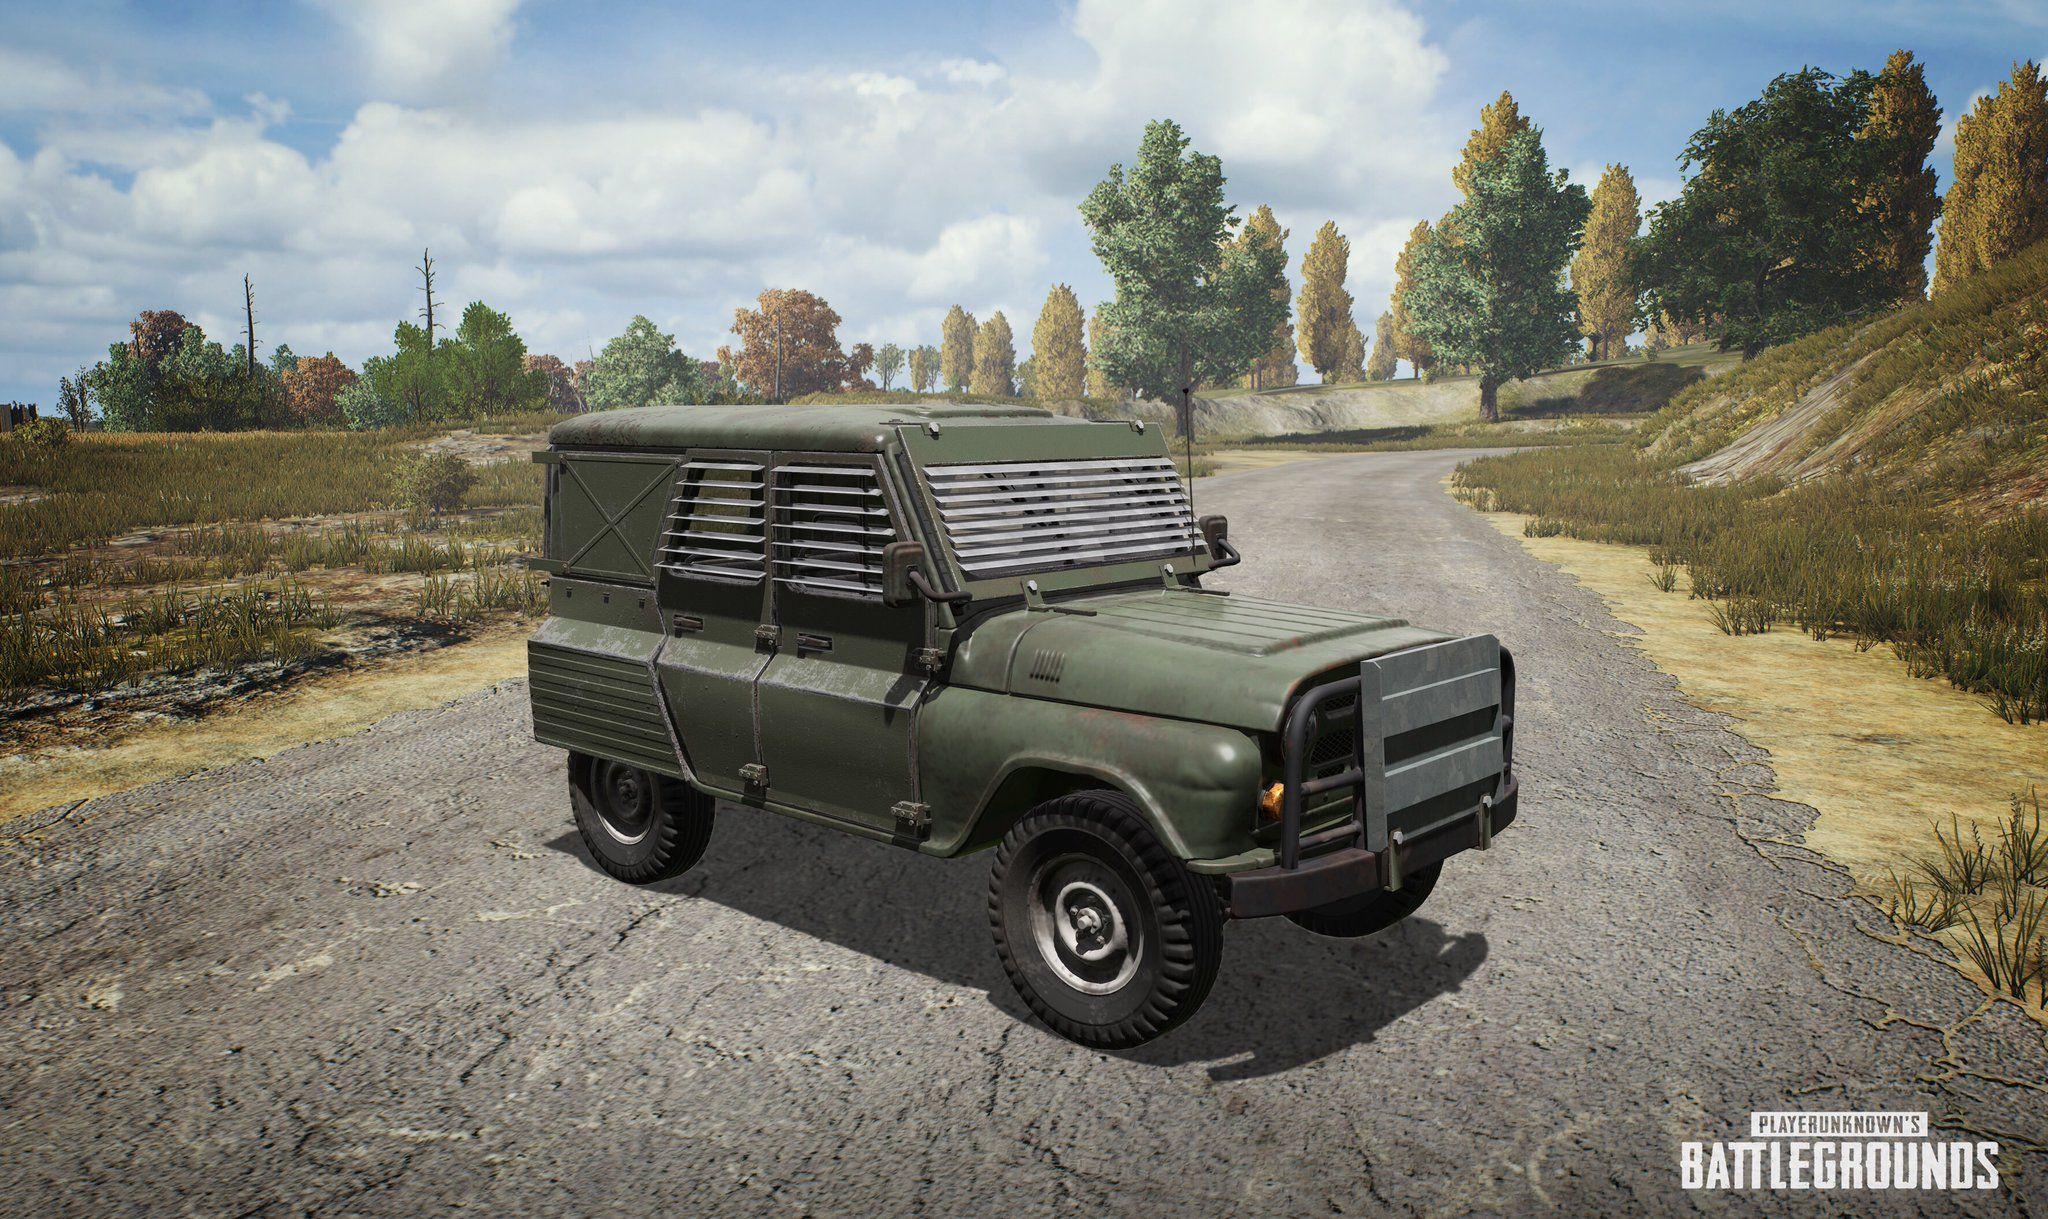 Pubg Wallpaper Flare Gun: 'PUBG' Metal Rain Event Adds Special Vehicle